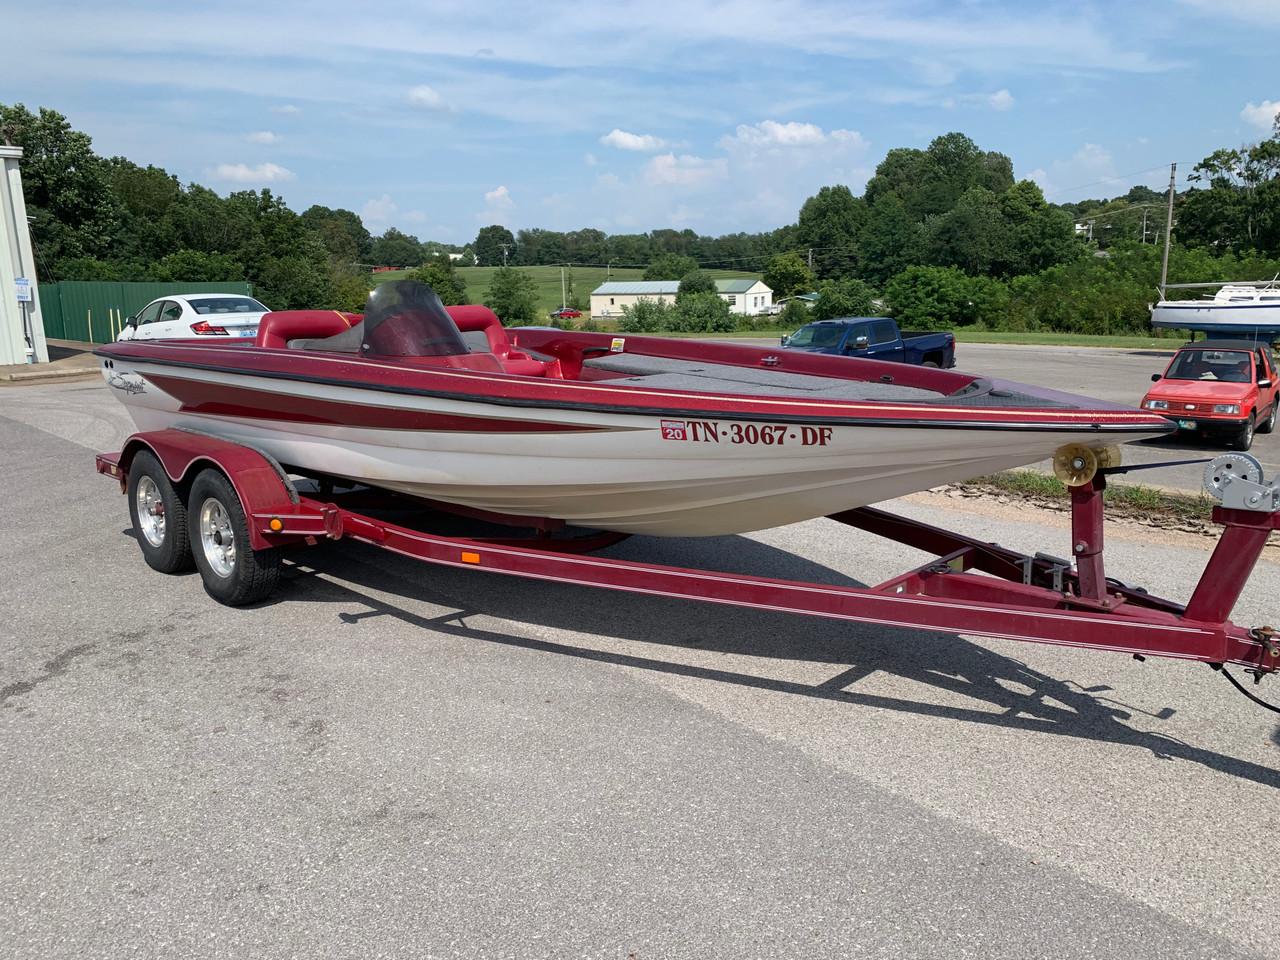 2001 Sprint 297 Pro 19' Fiberglass Bass Boat with Tandem Axle Trailer